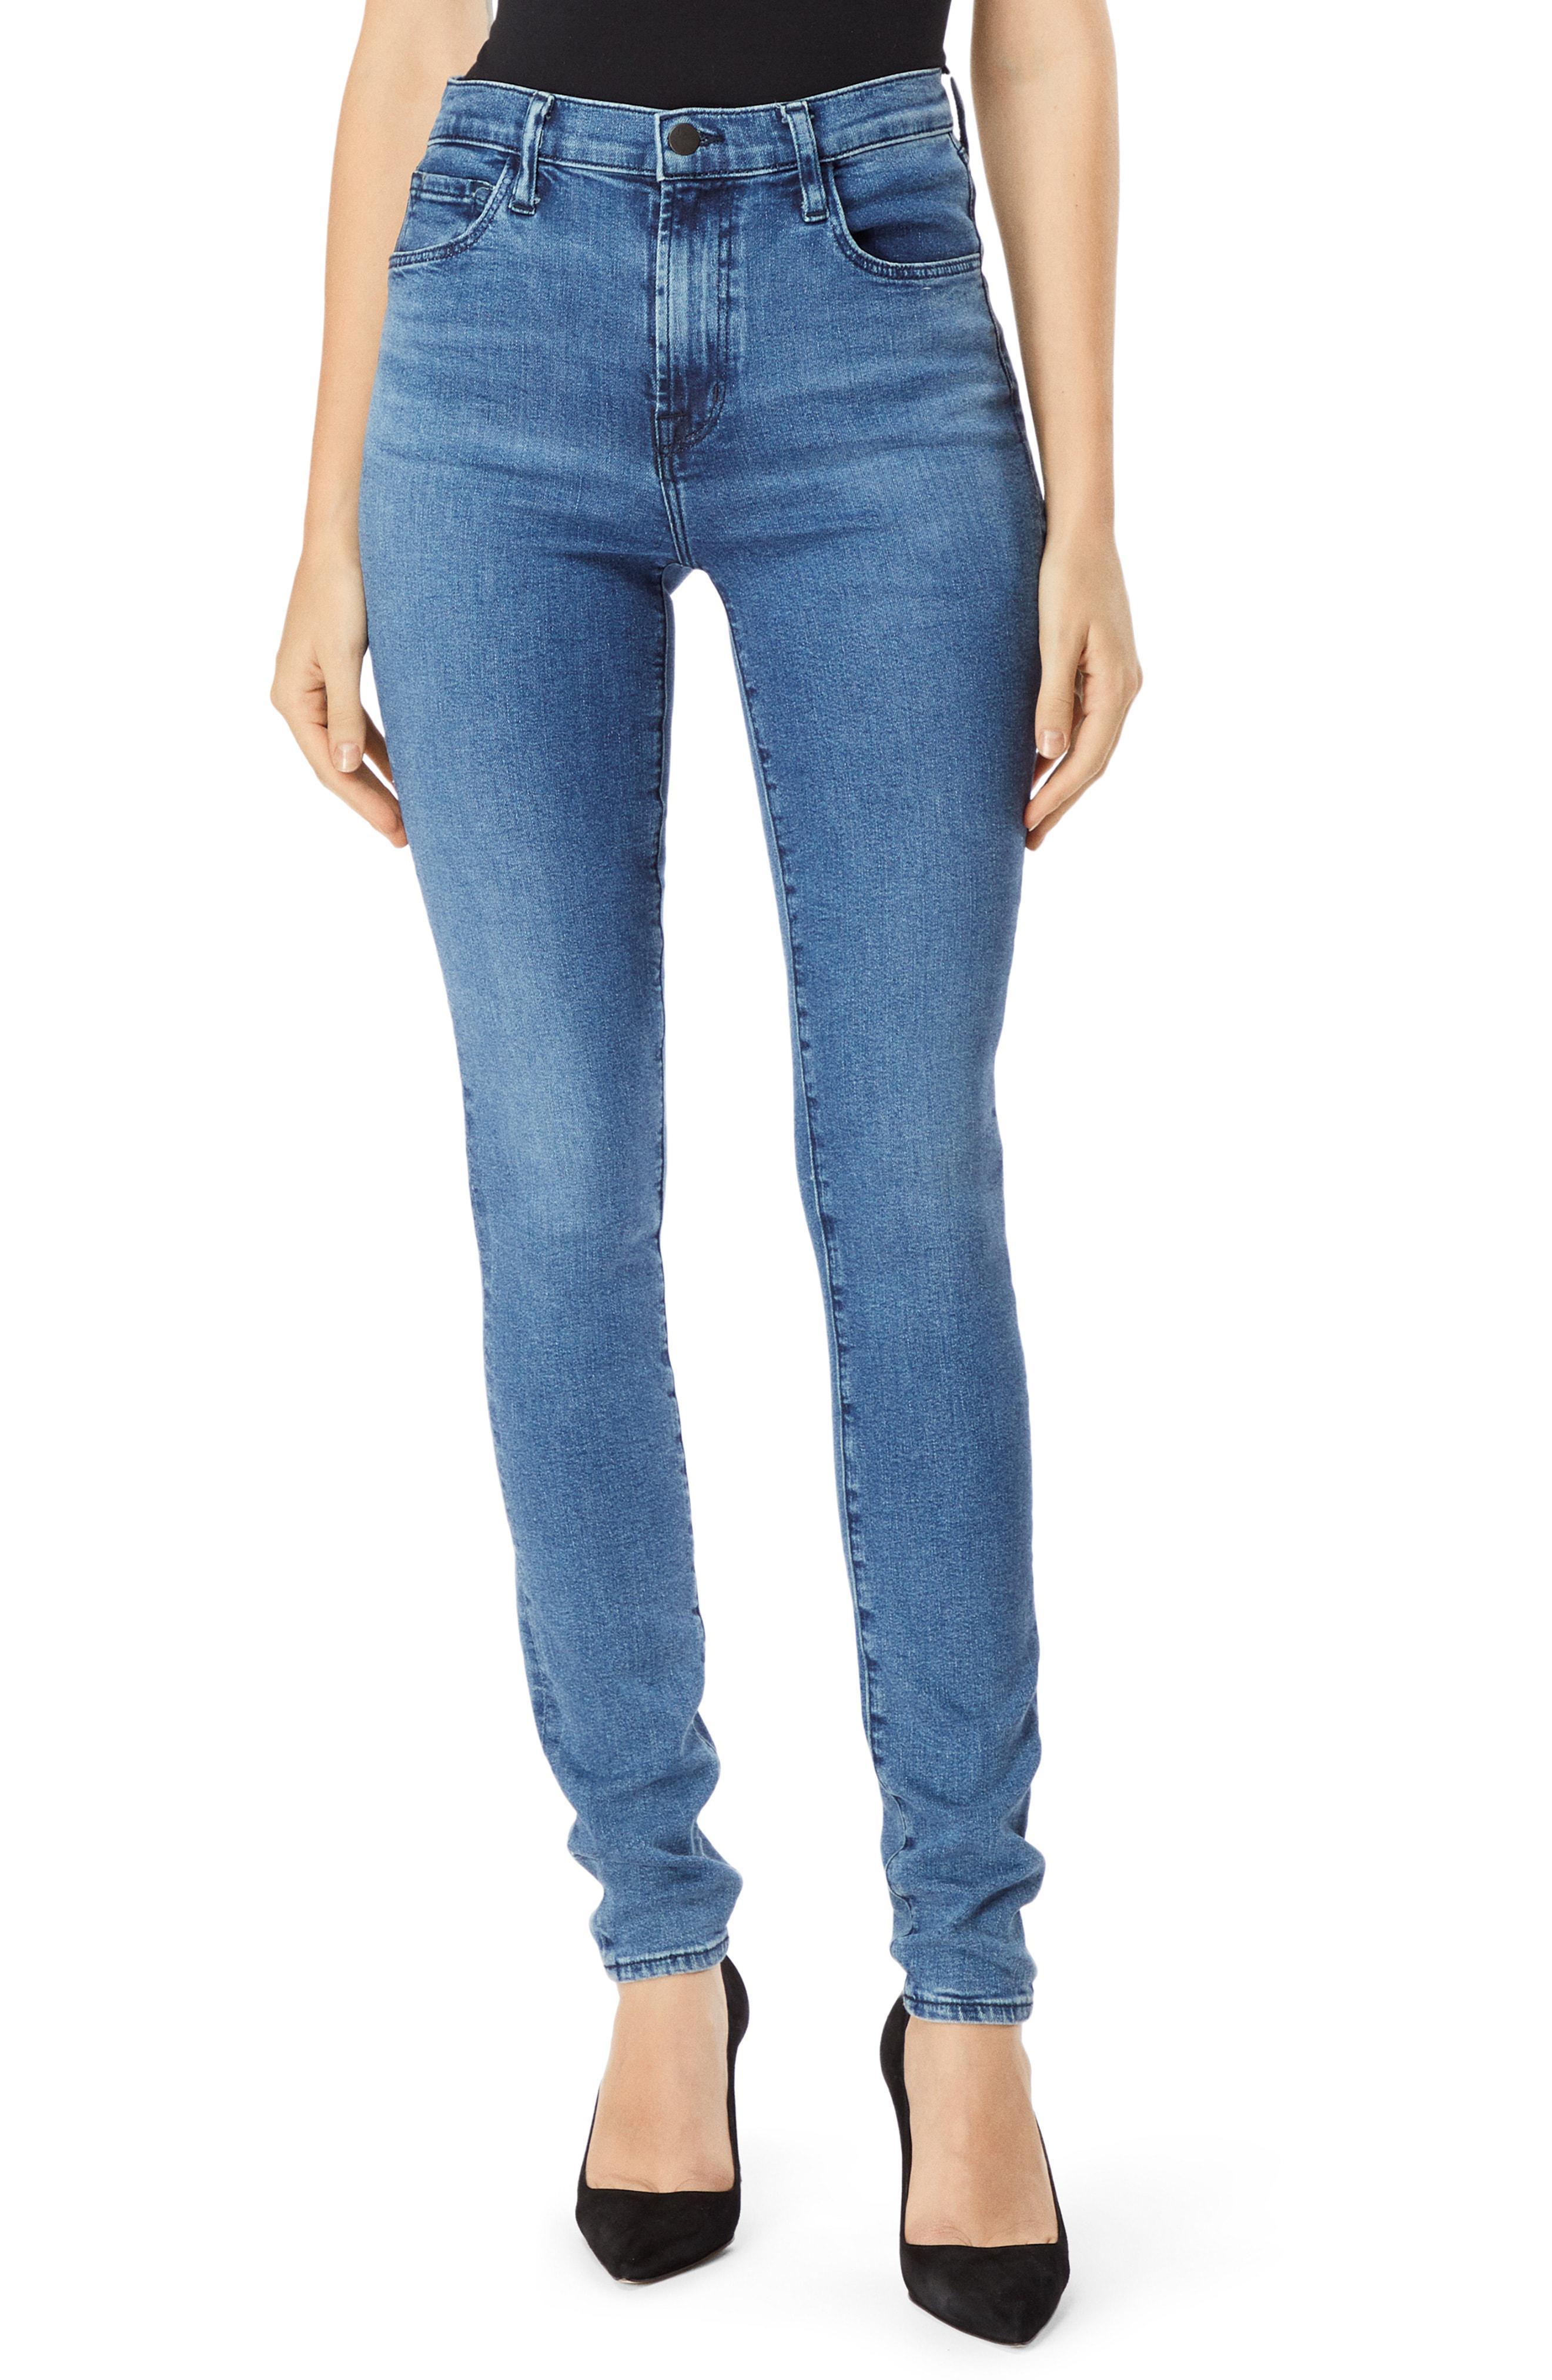 93411ccb01936 Lyst - J Brand Carolina Super High Waist Skinny Jeans in Blue